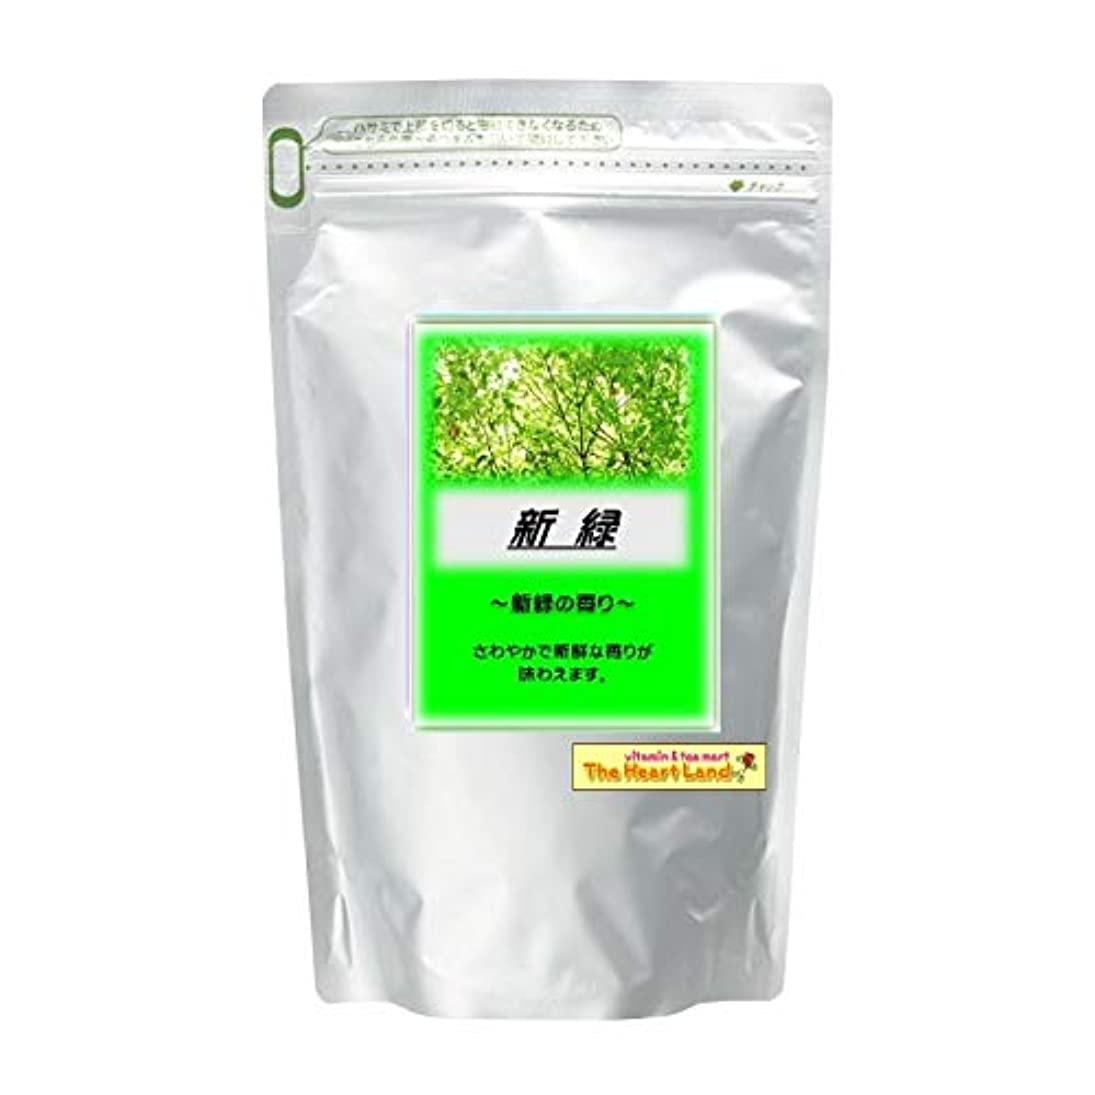 交流する信者受益者アサヒ入浴剤 浴用入浴化粧品 新緑 2.5kg